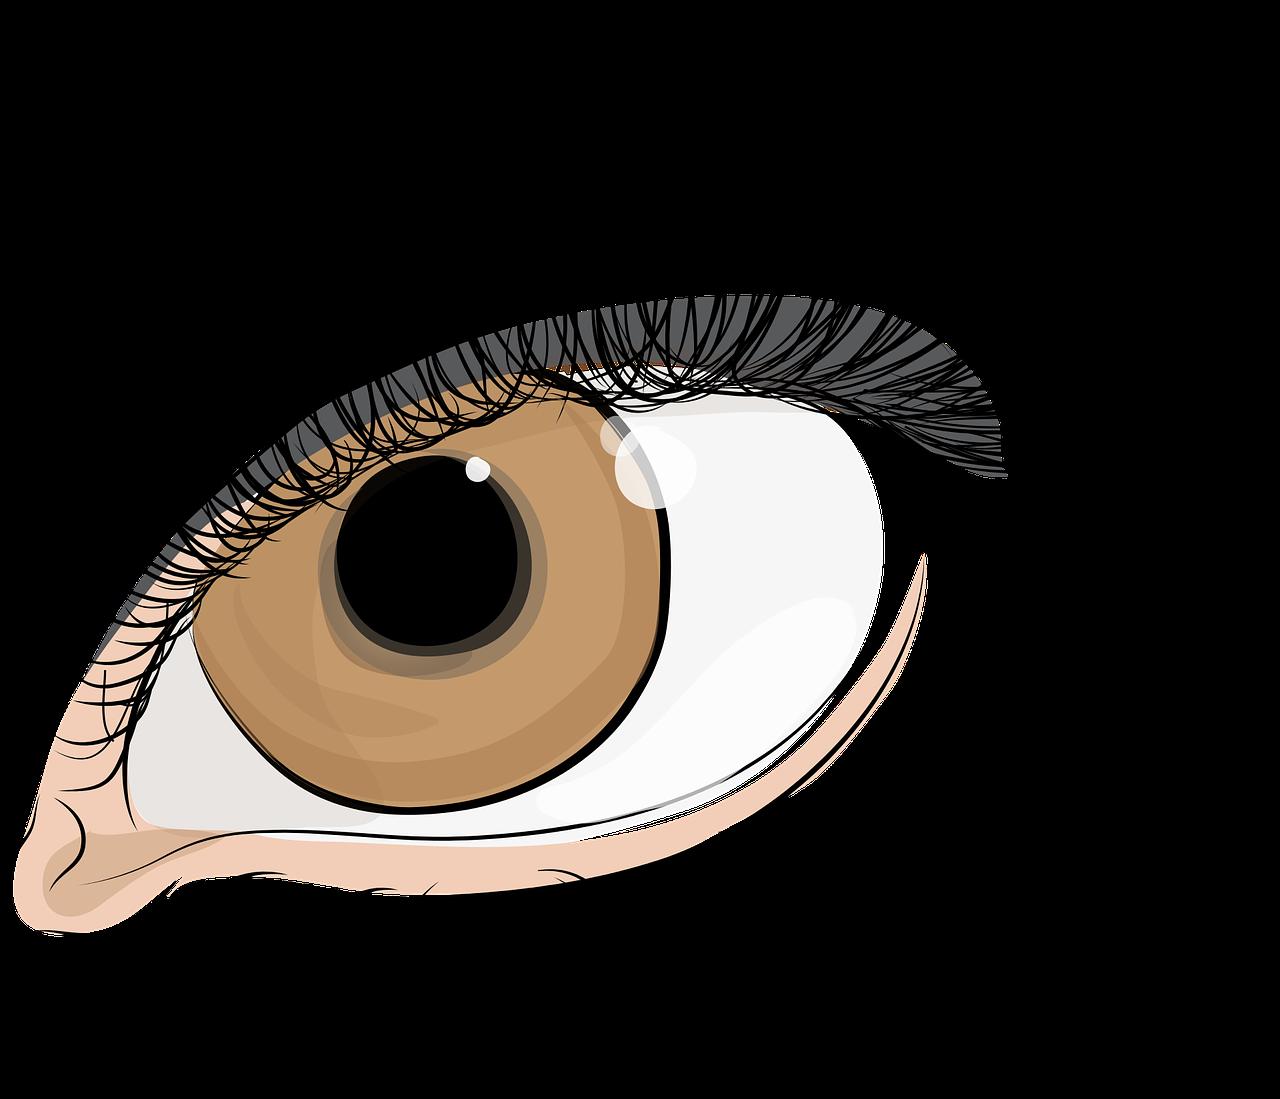 Eyelashes clipart file. The eye of women